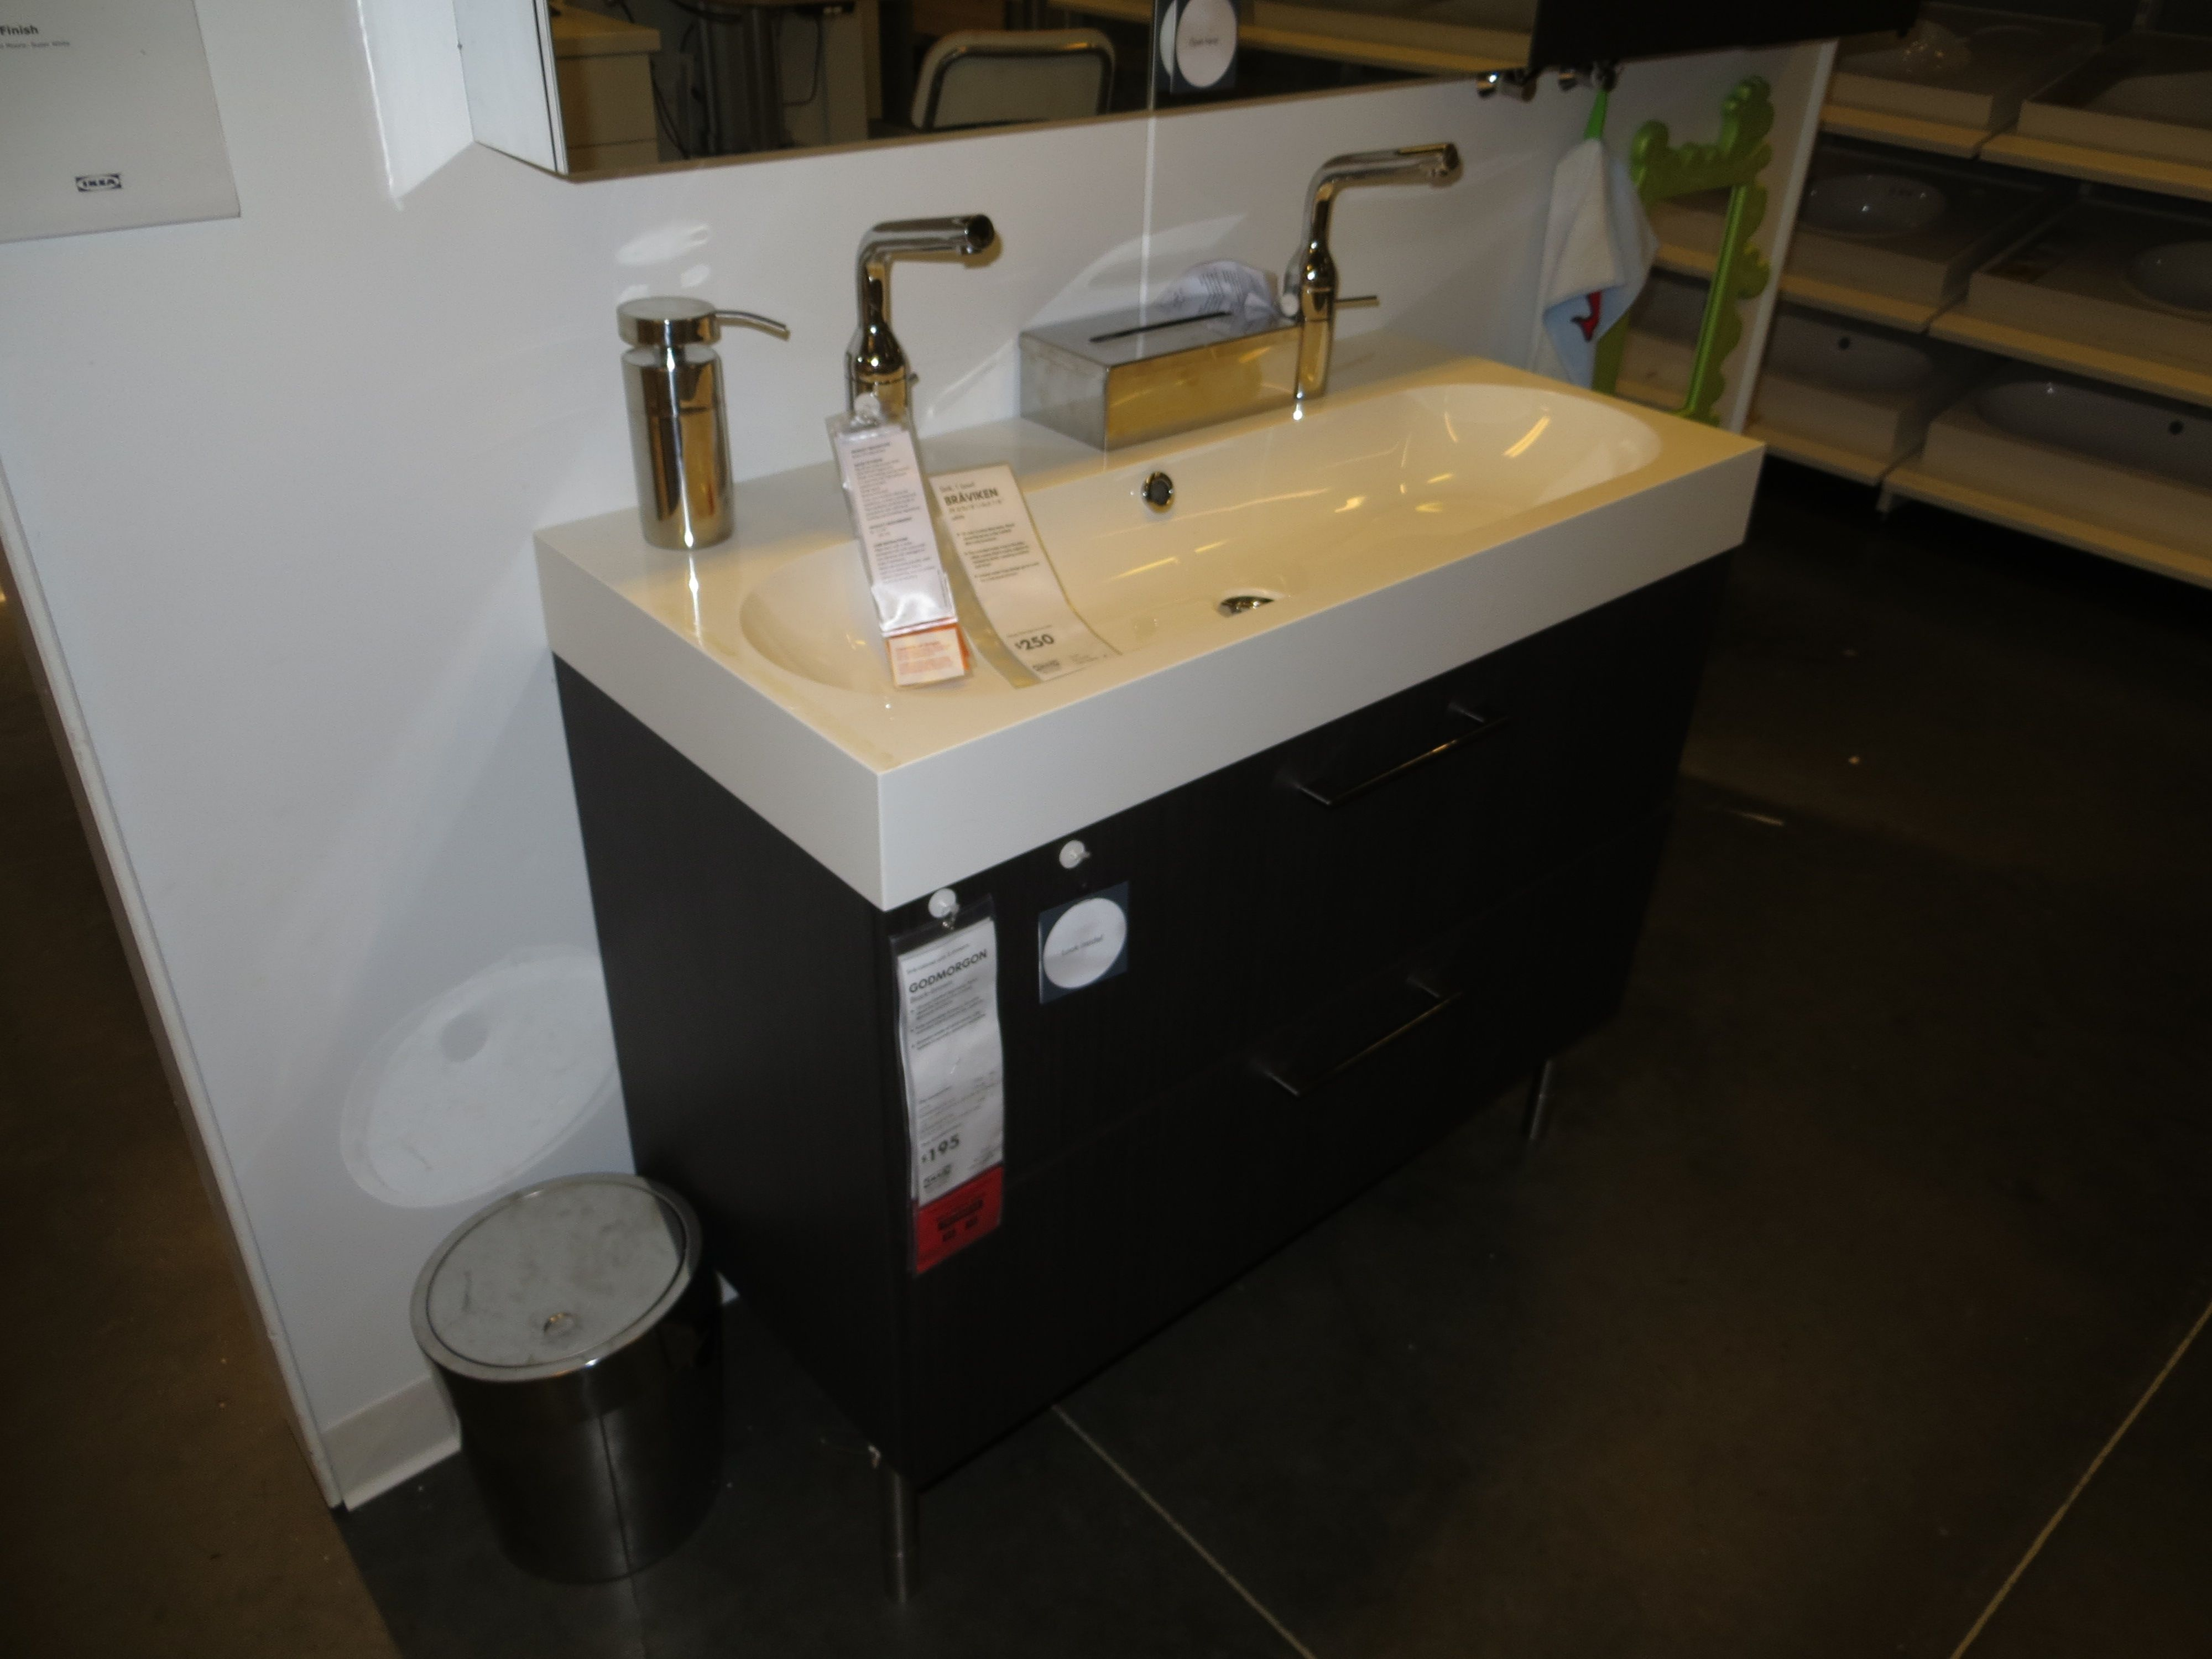 Single Basin Double Faucet Bathroom Sink Wooden Bathroom Vanity